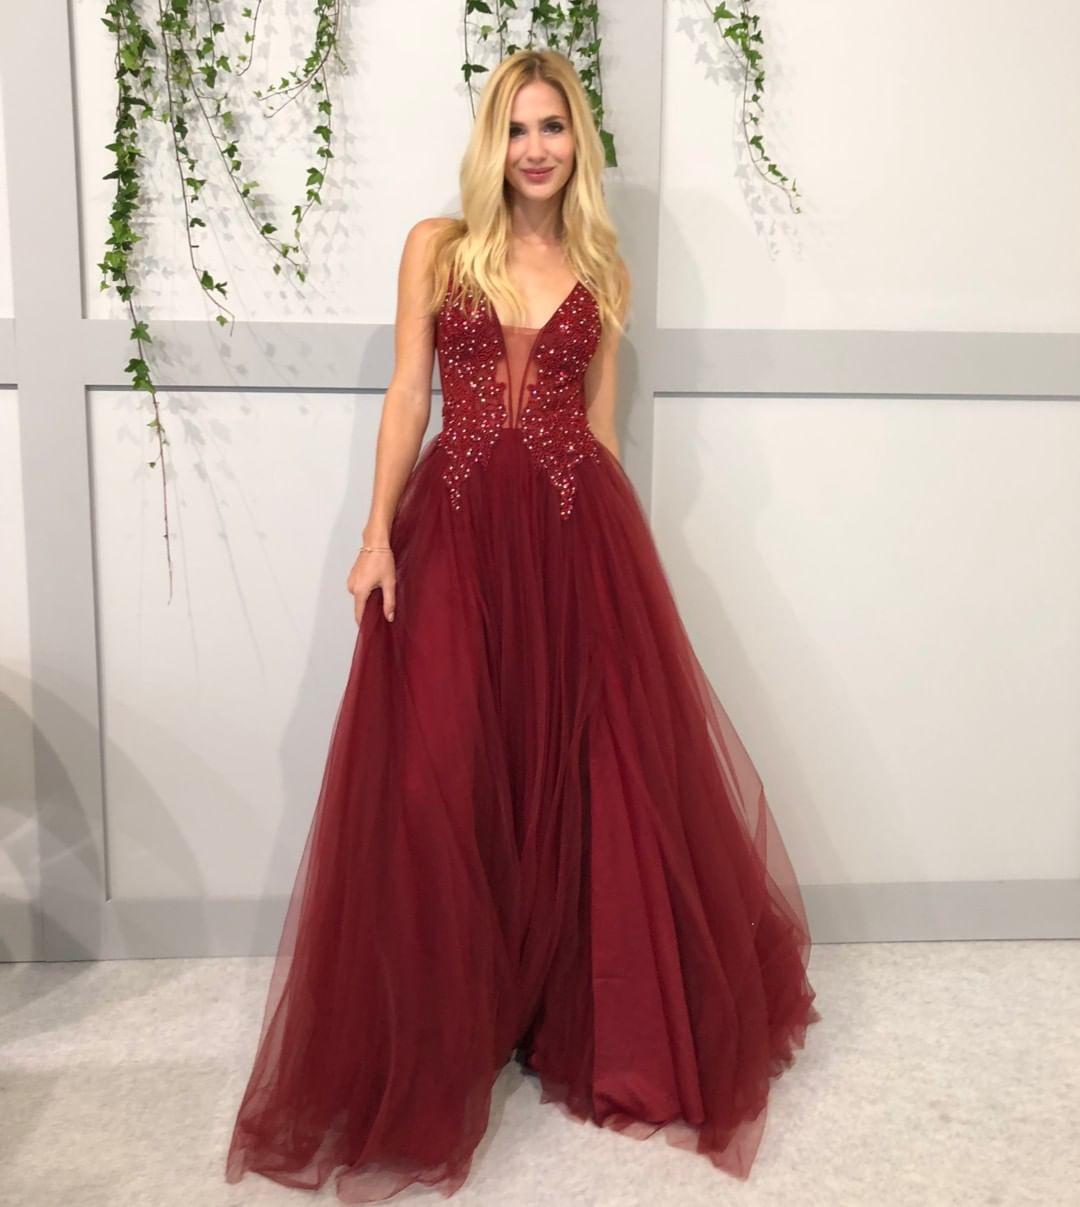 13 Schön Abend Kleid Elegant Lang Bester PreisDesigner Top Abend Kleid Elegant Lang Vertrieb